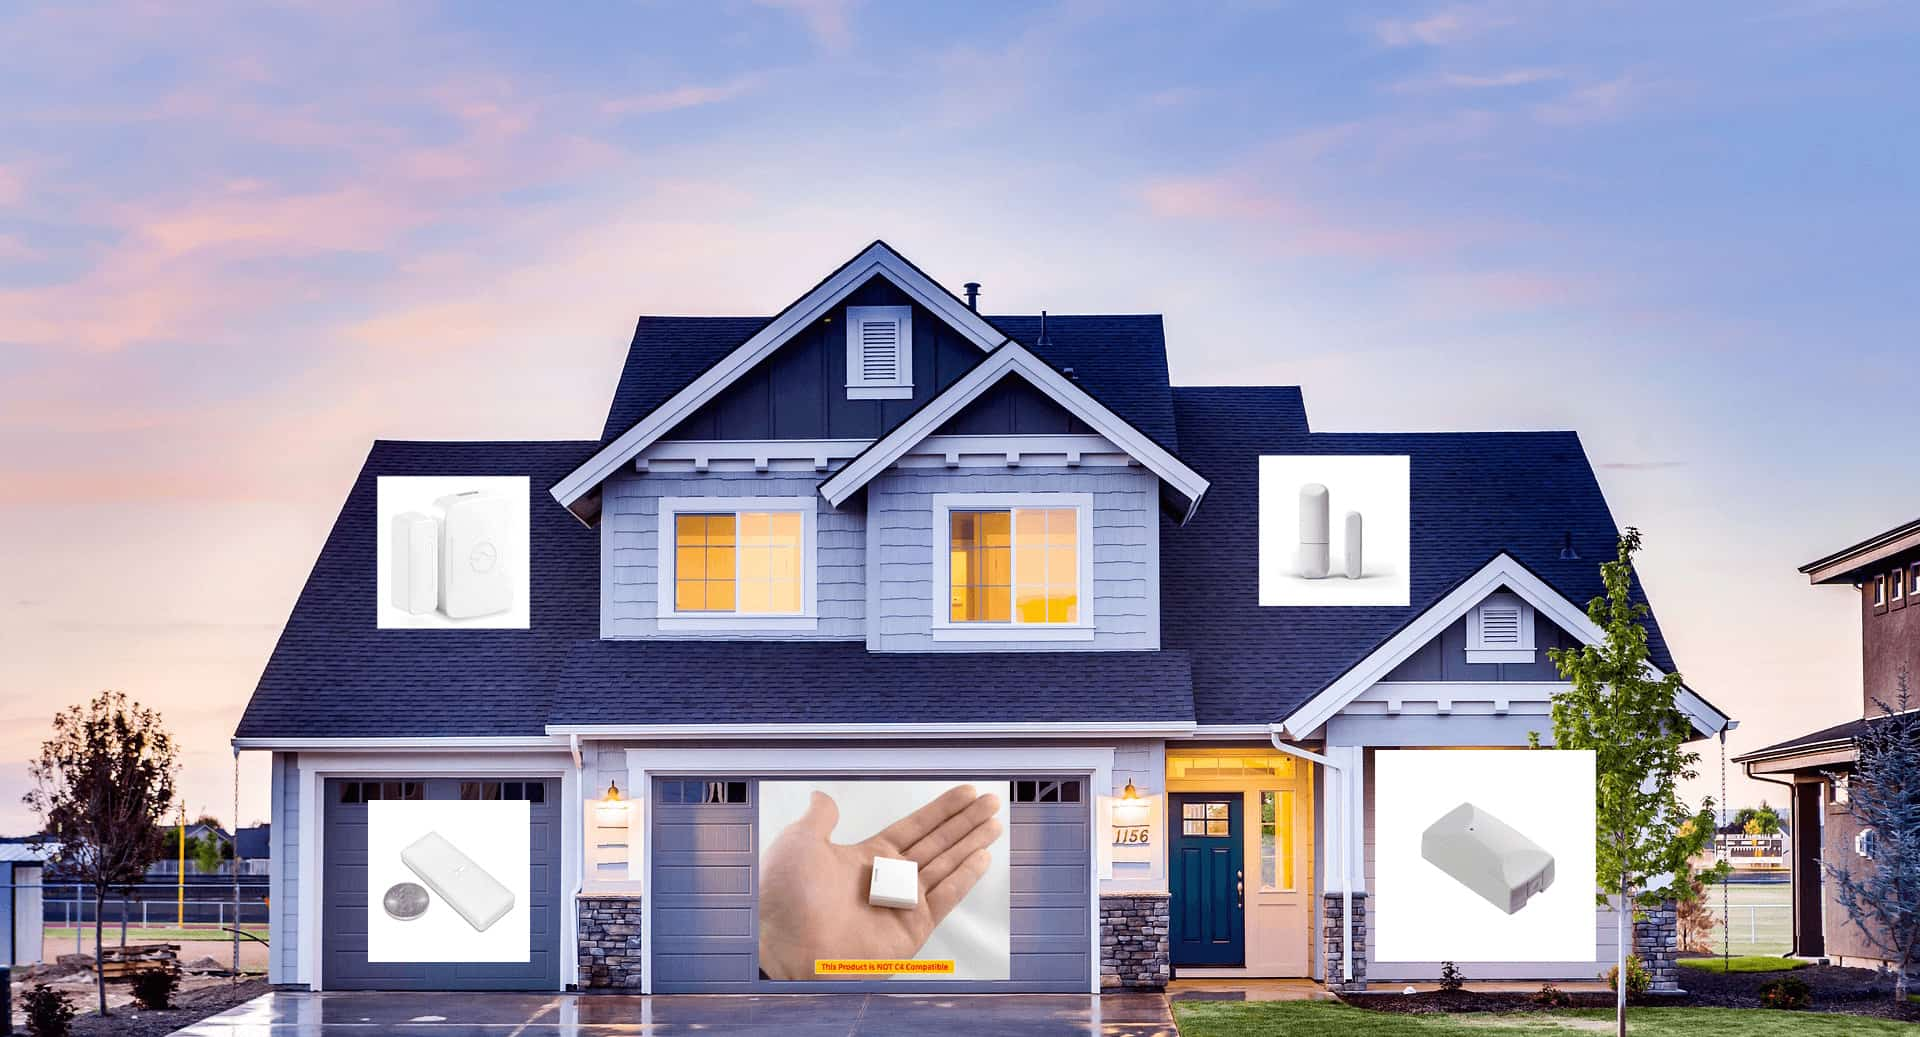 5-Best-Smartthings-Garage-door-sensors-in-2018---reviewed-and-compared-hero